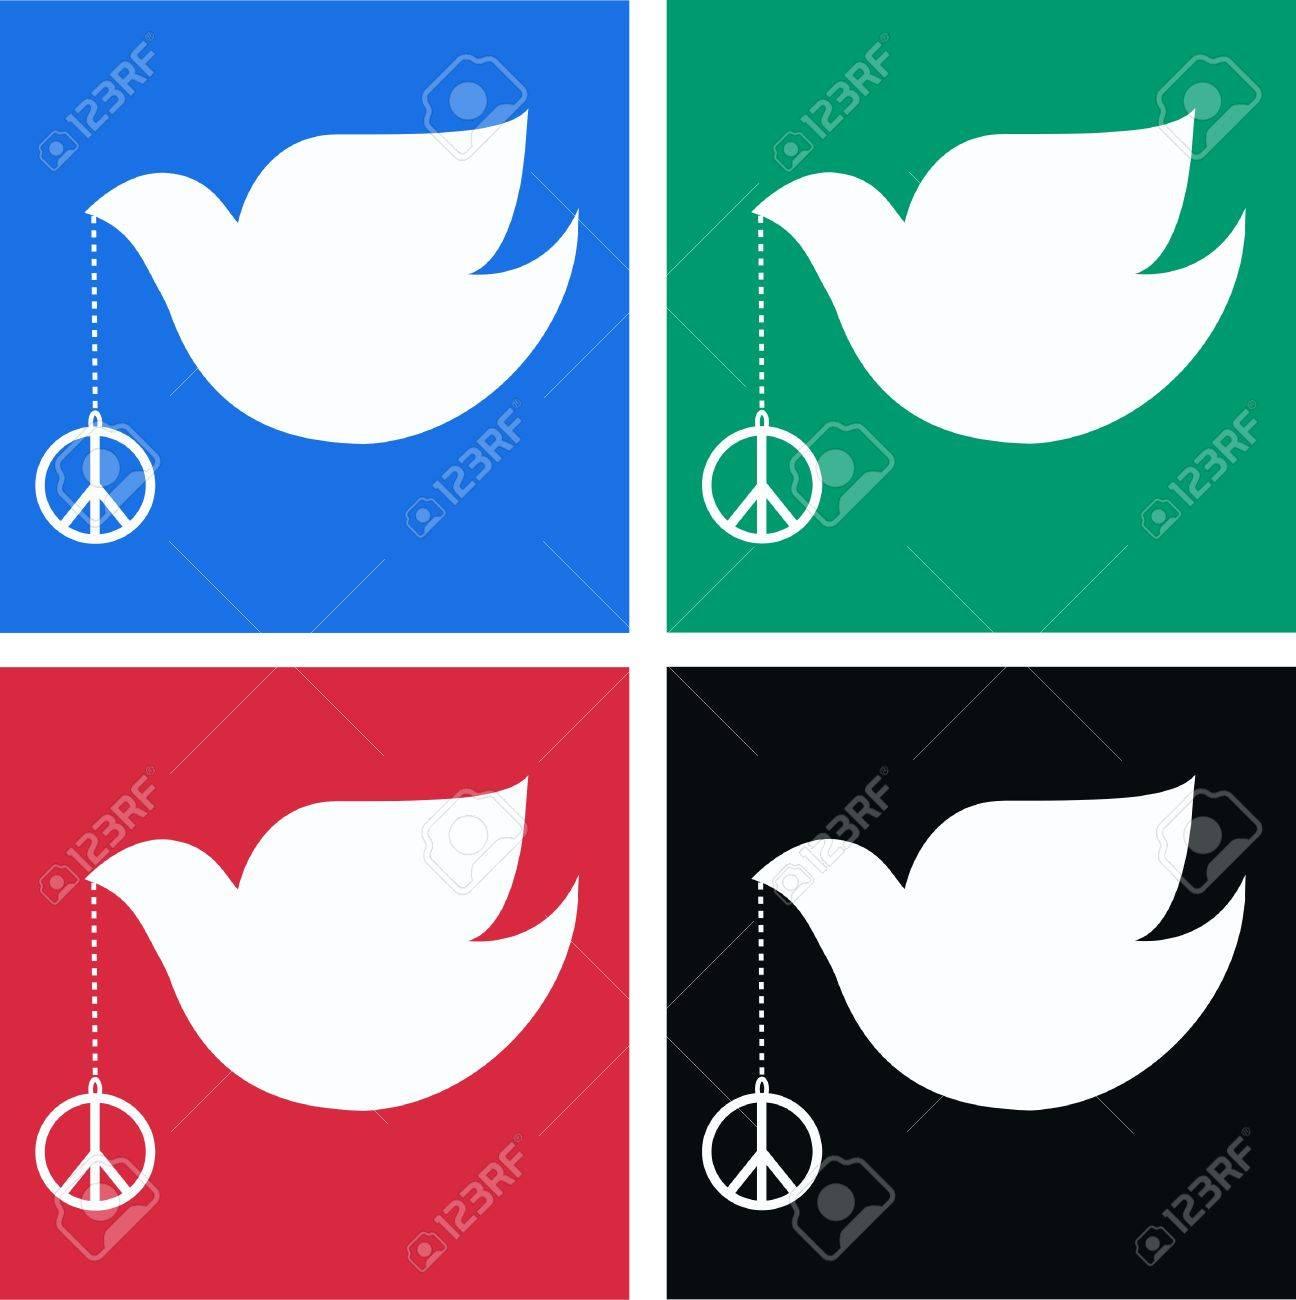 peace doves Stock Vector - 8767361